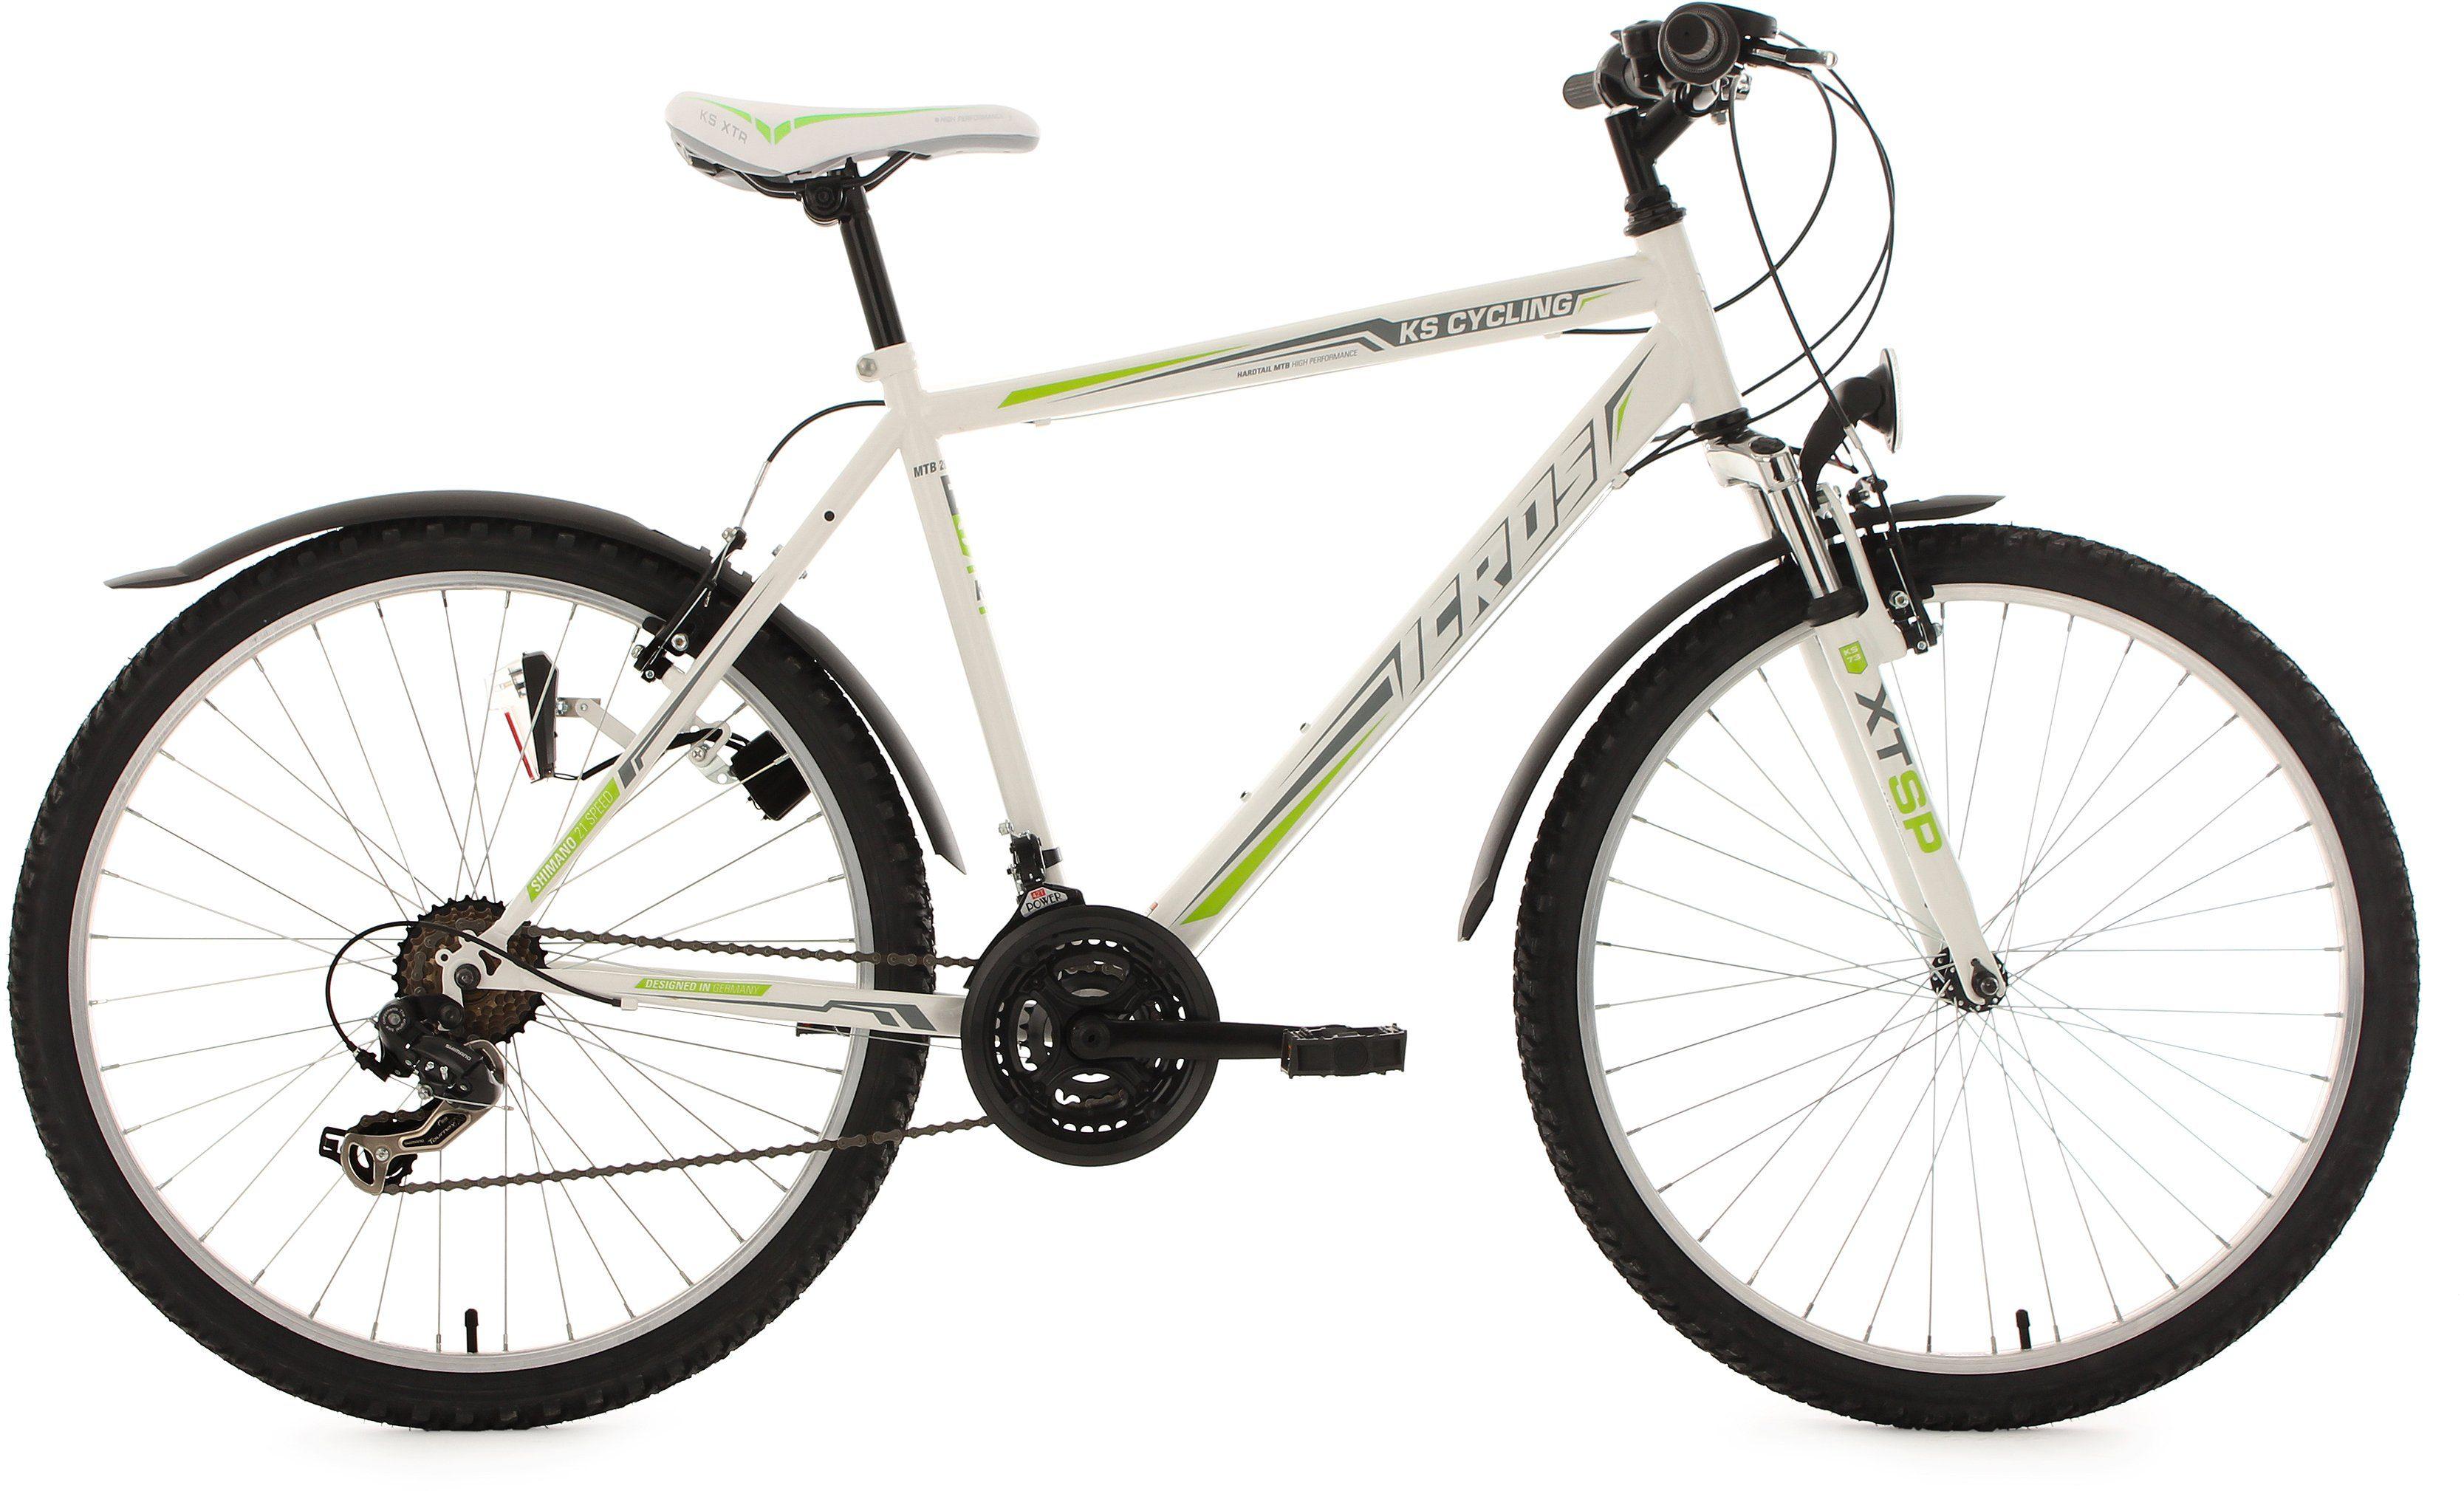 KS Cycling Herren Hardtail-MTB, 26 Zoll, 21 Gang-Shimano Tourney Kettenschaltung, weiß-grün, »Icros«